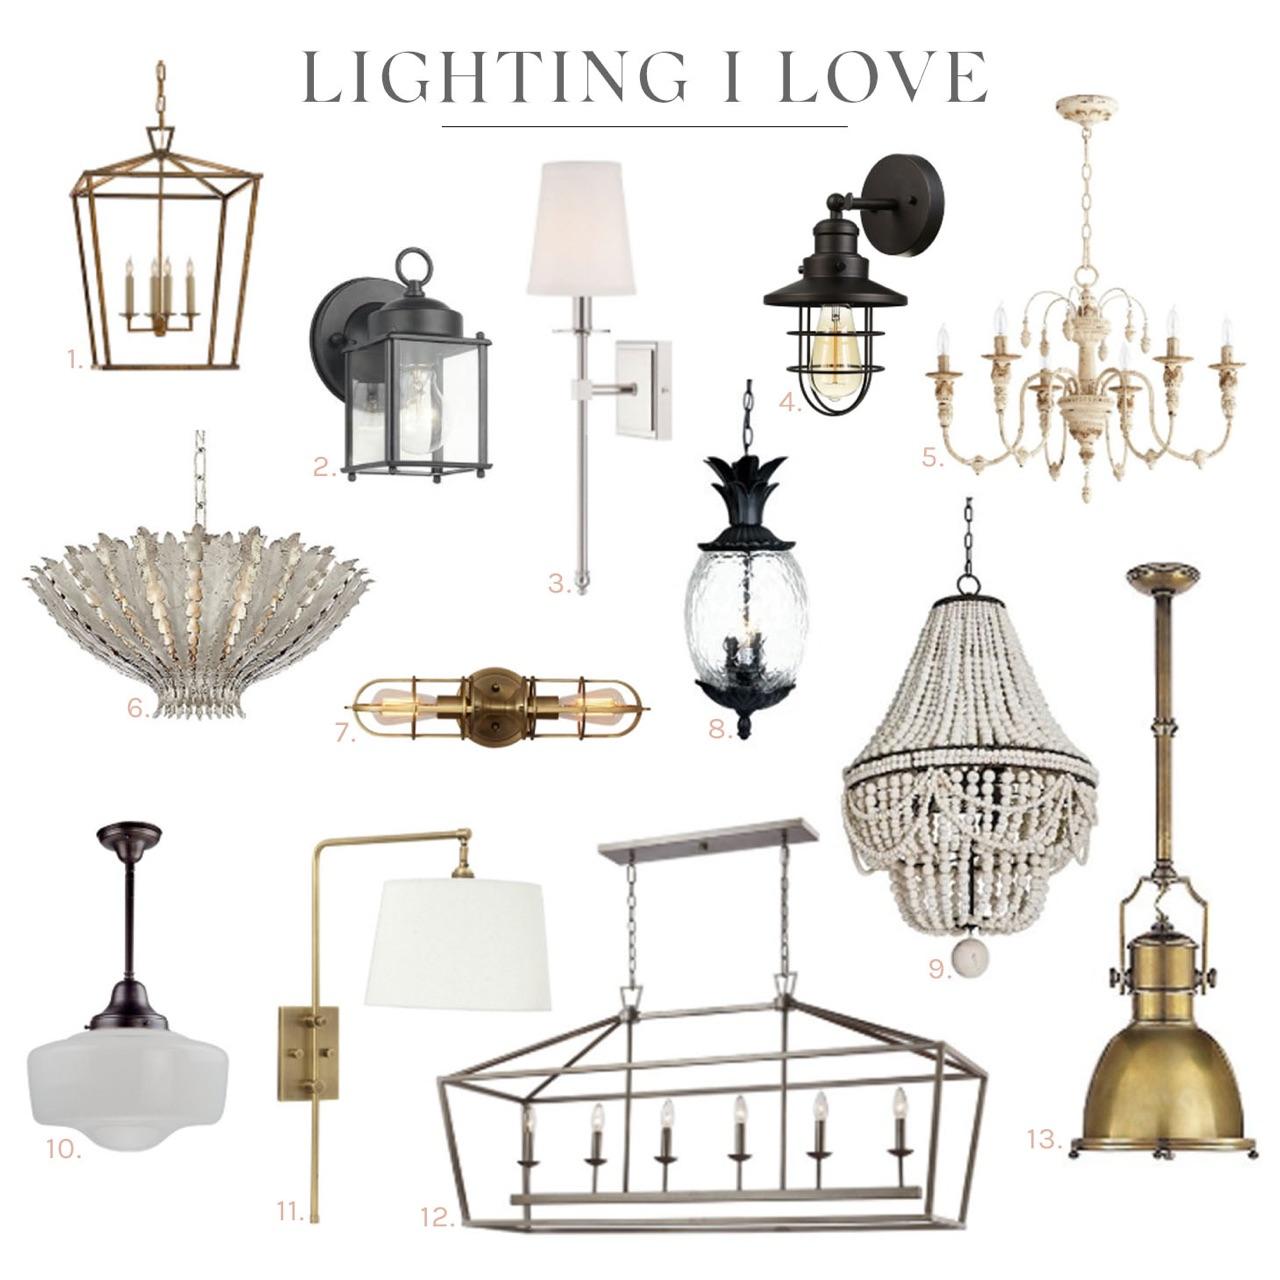 In My Home: Lighting I Love Regarding Carmen 6 Light Lantern Geometric Pendants (View 15 of 30)